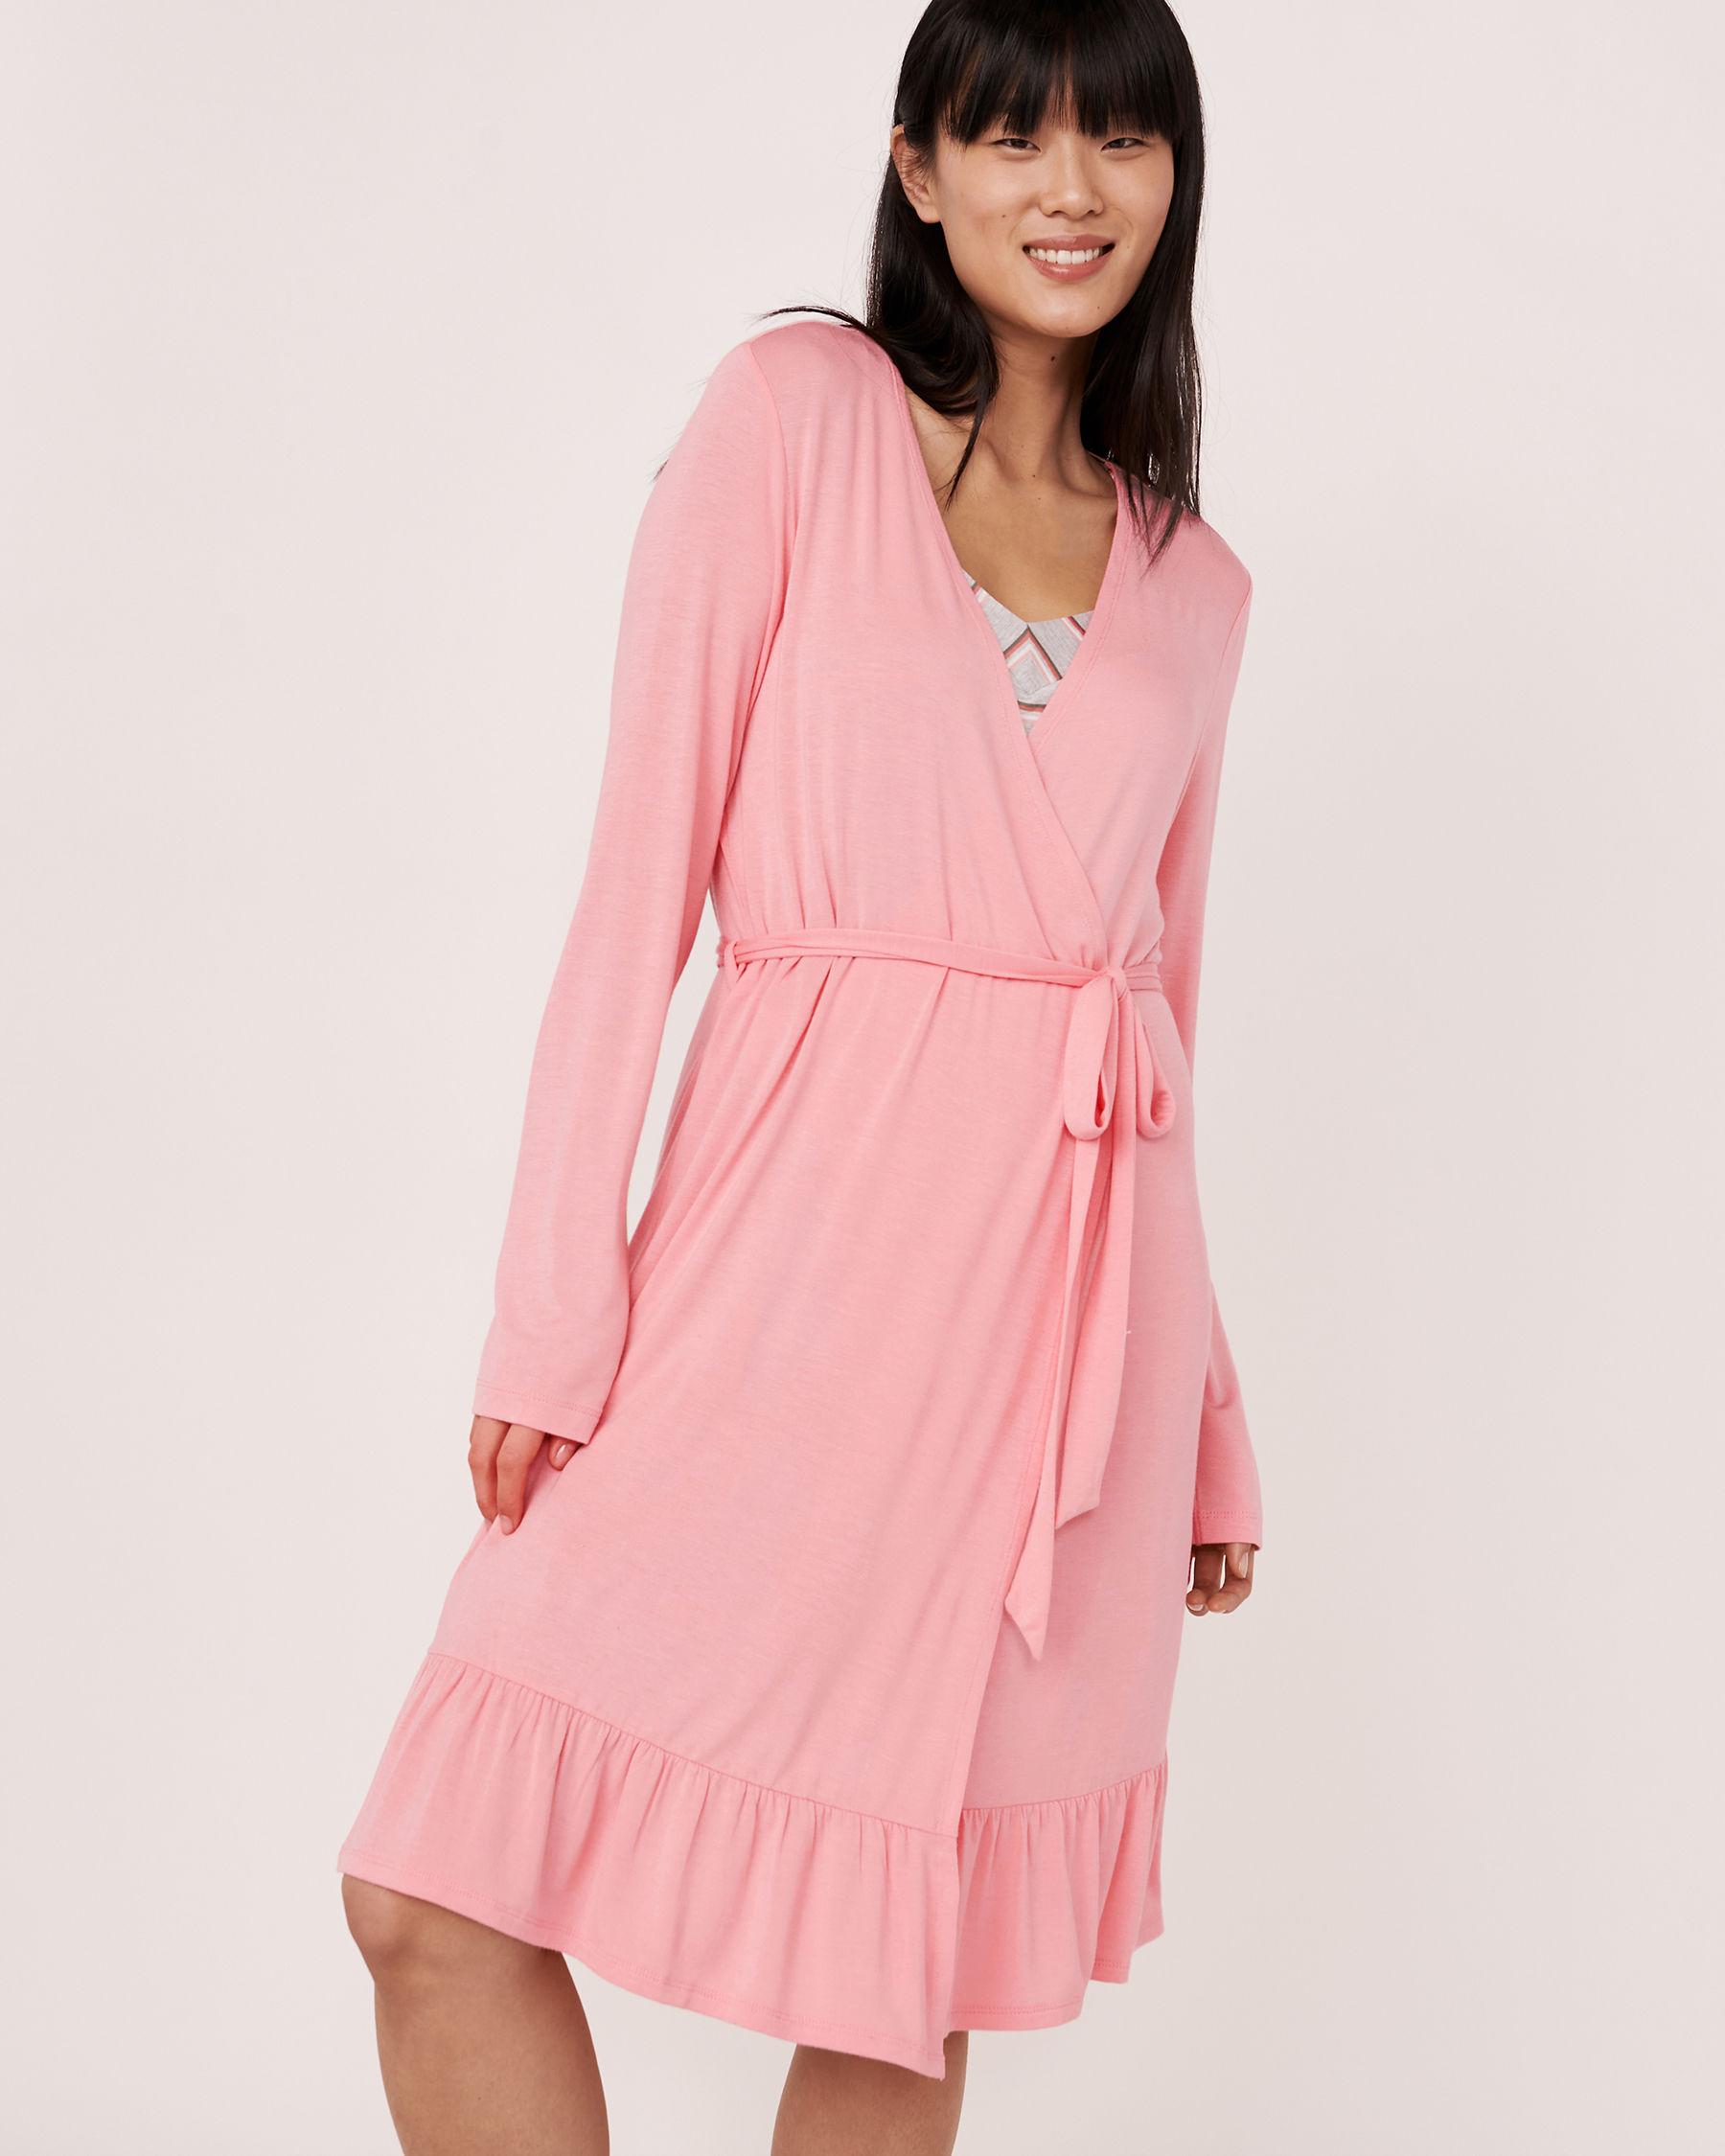 LA VIE EN ROSE Ruffle Details Robe Pink 40600007 - View1